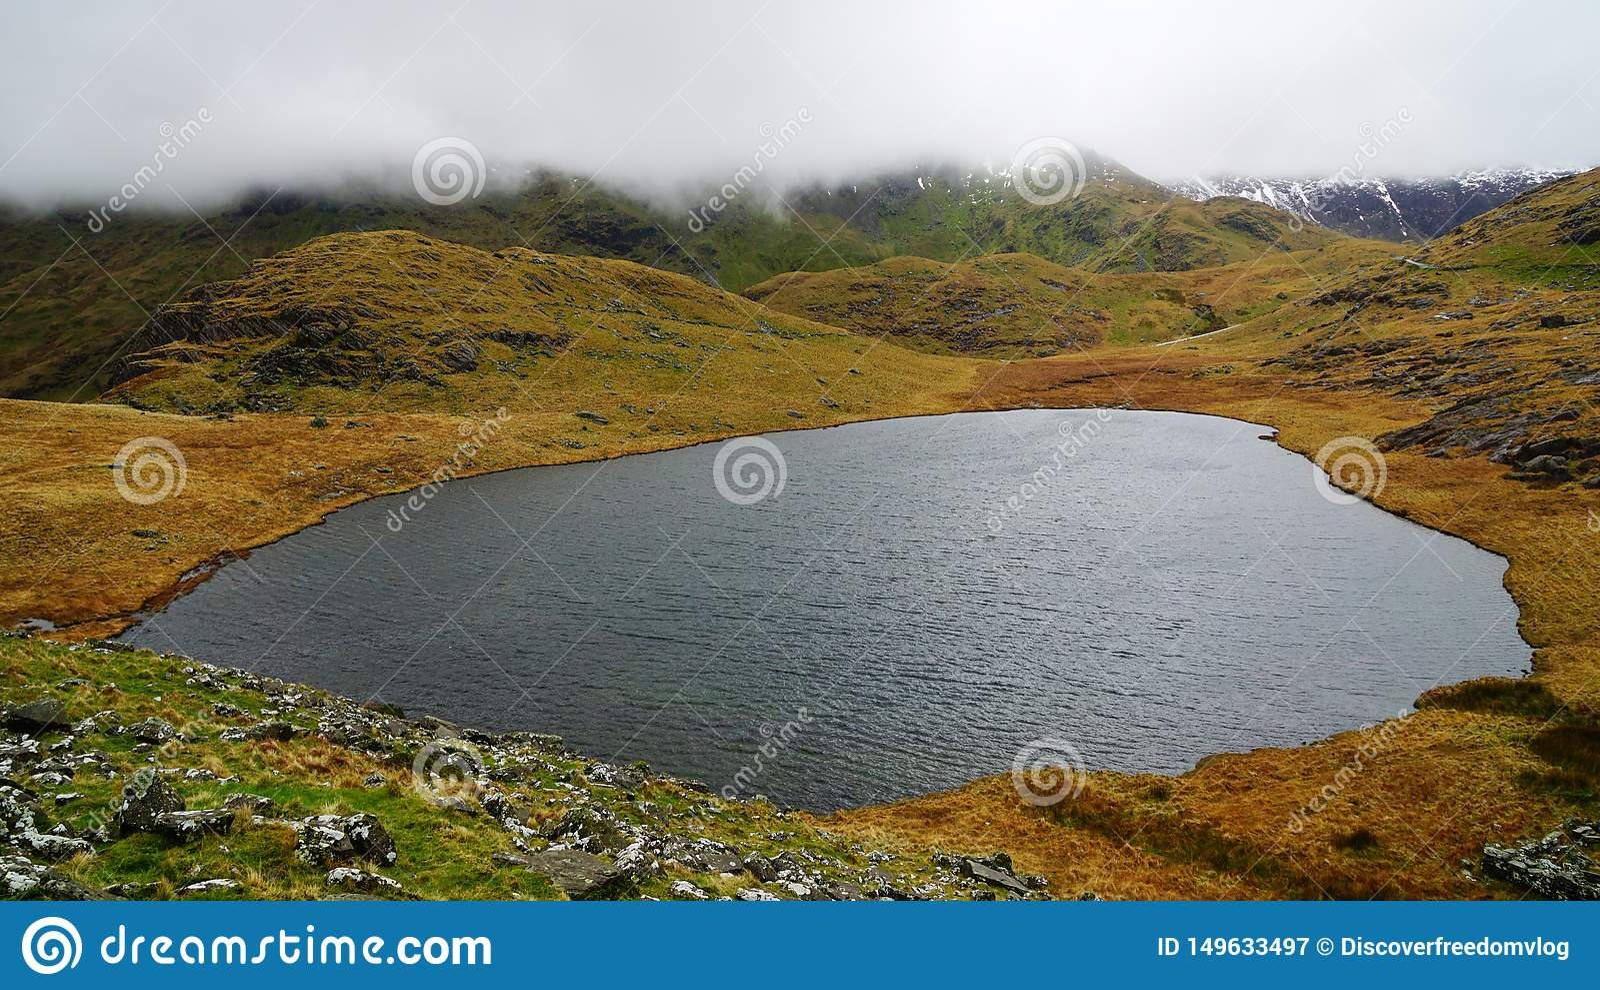 Beautiful Lake in Snowdonia National Park, Wales, United Kingdom